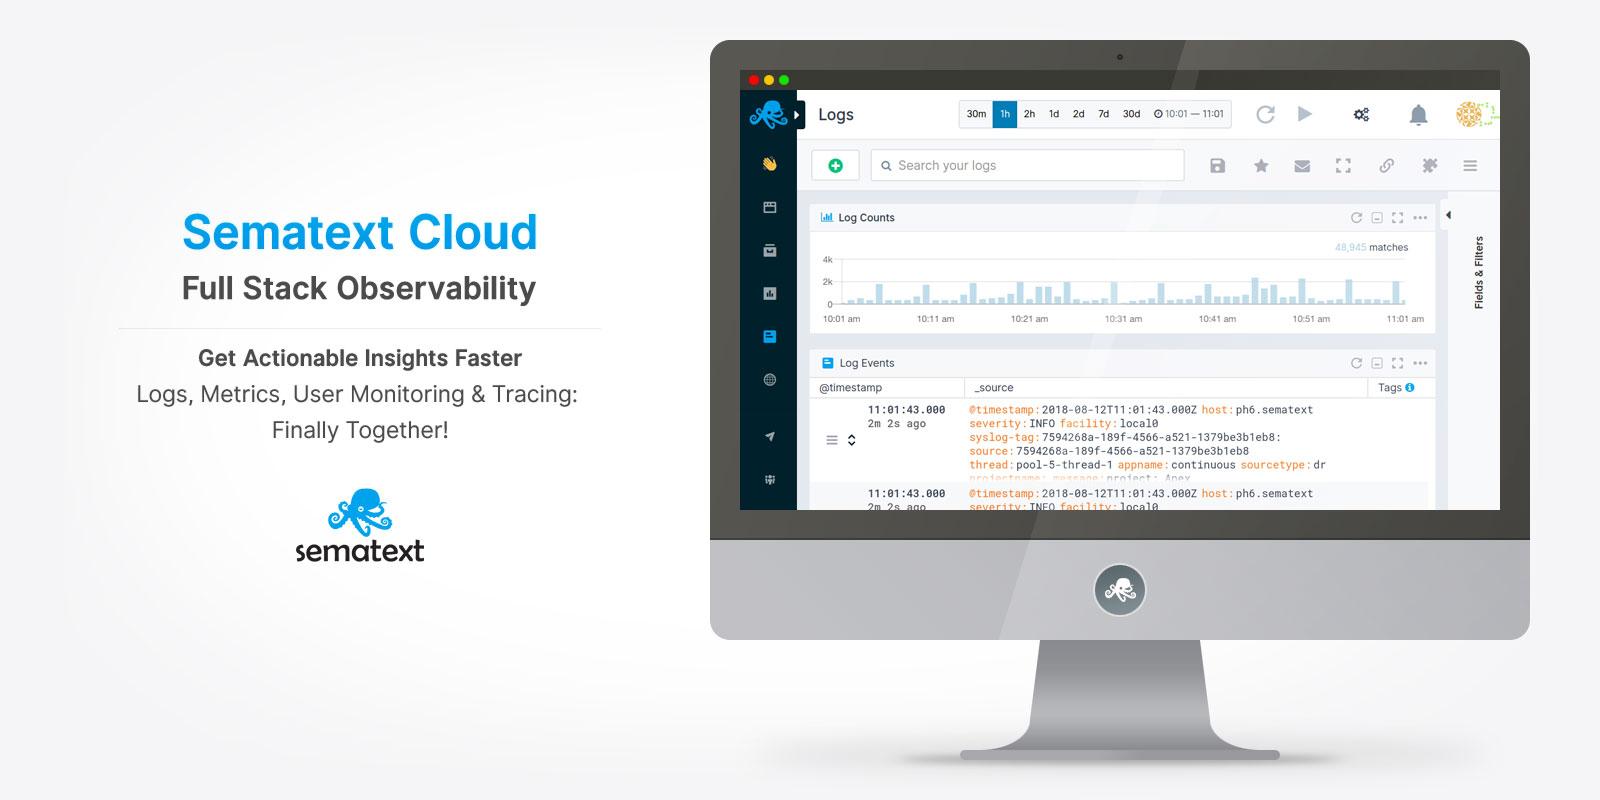 Seatext Cloud